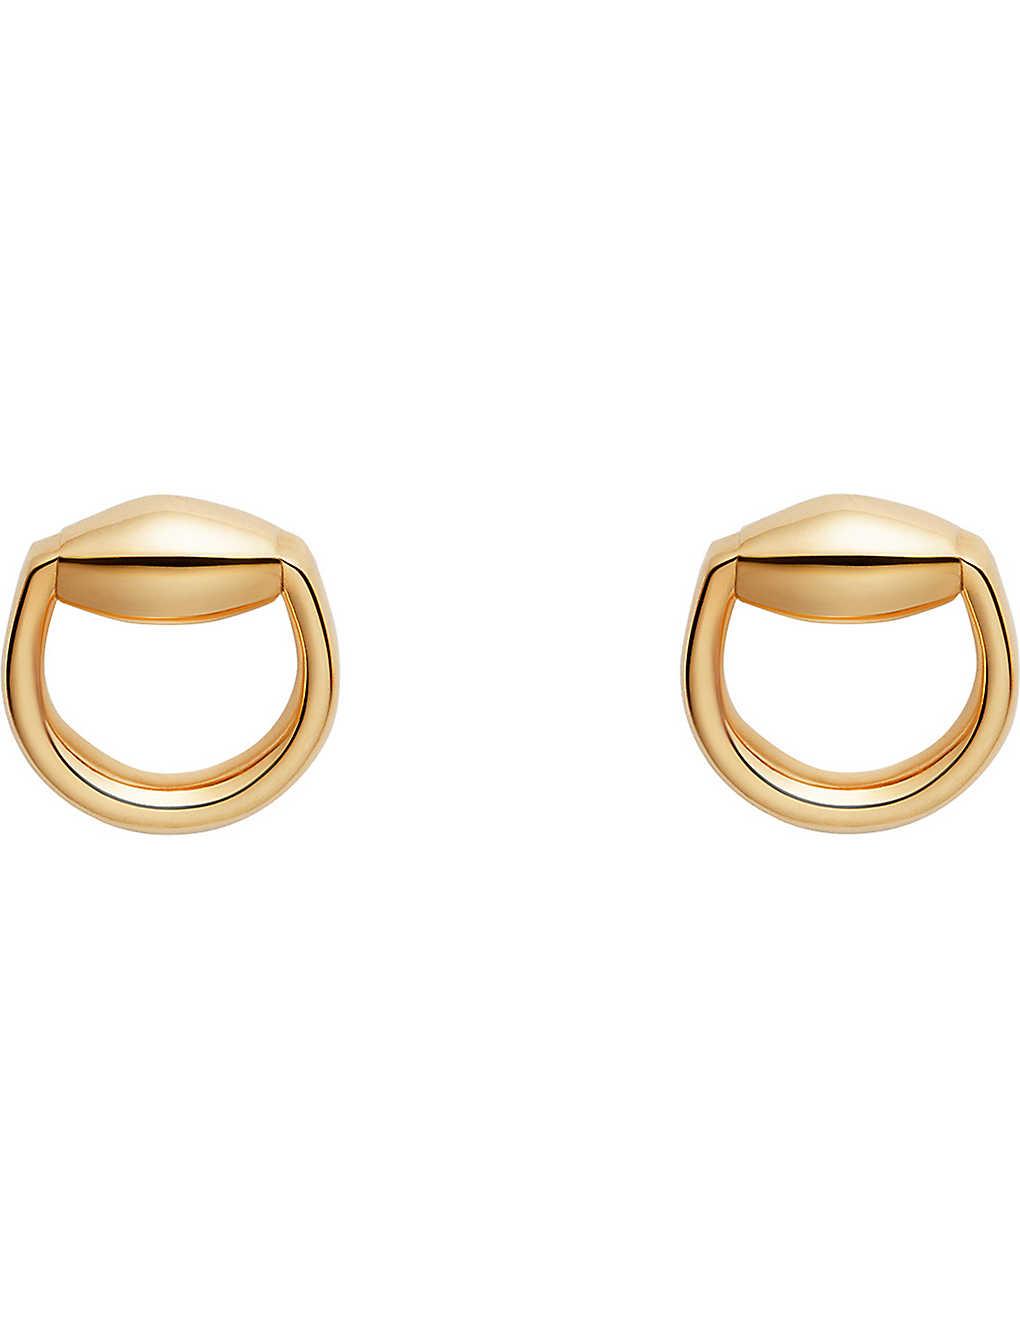 164244da9 GUCCI - Horsebit 18ct gold stud earrings | Selfridges.com